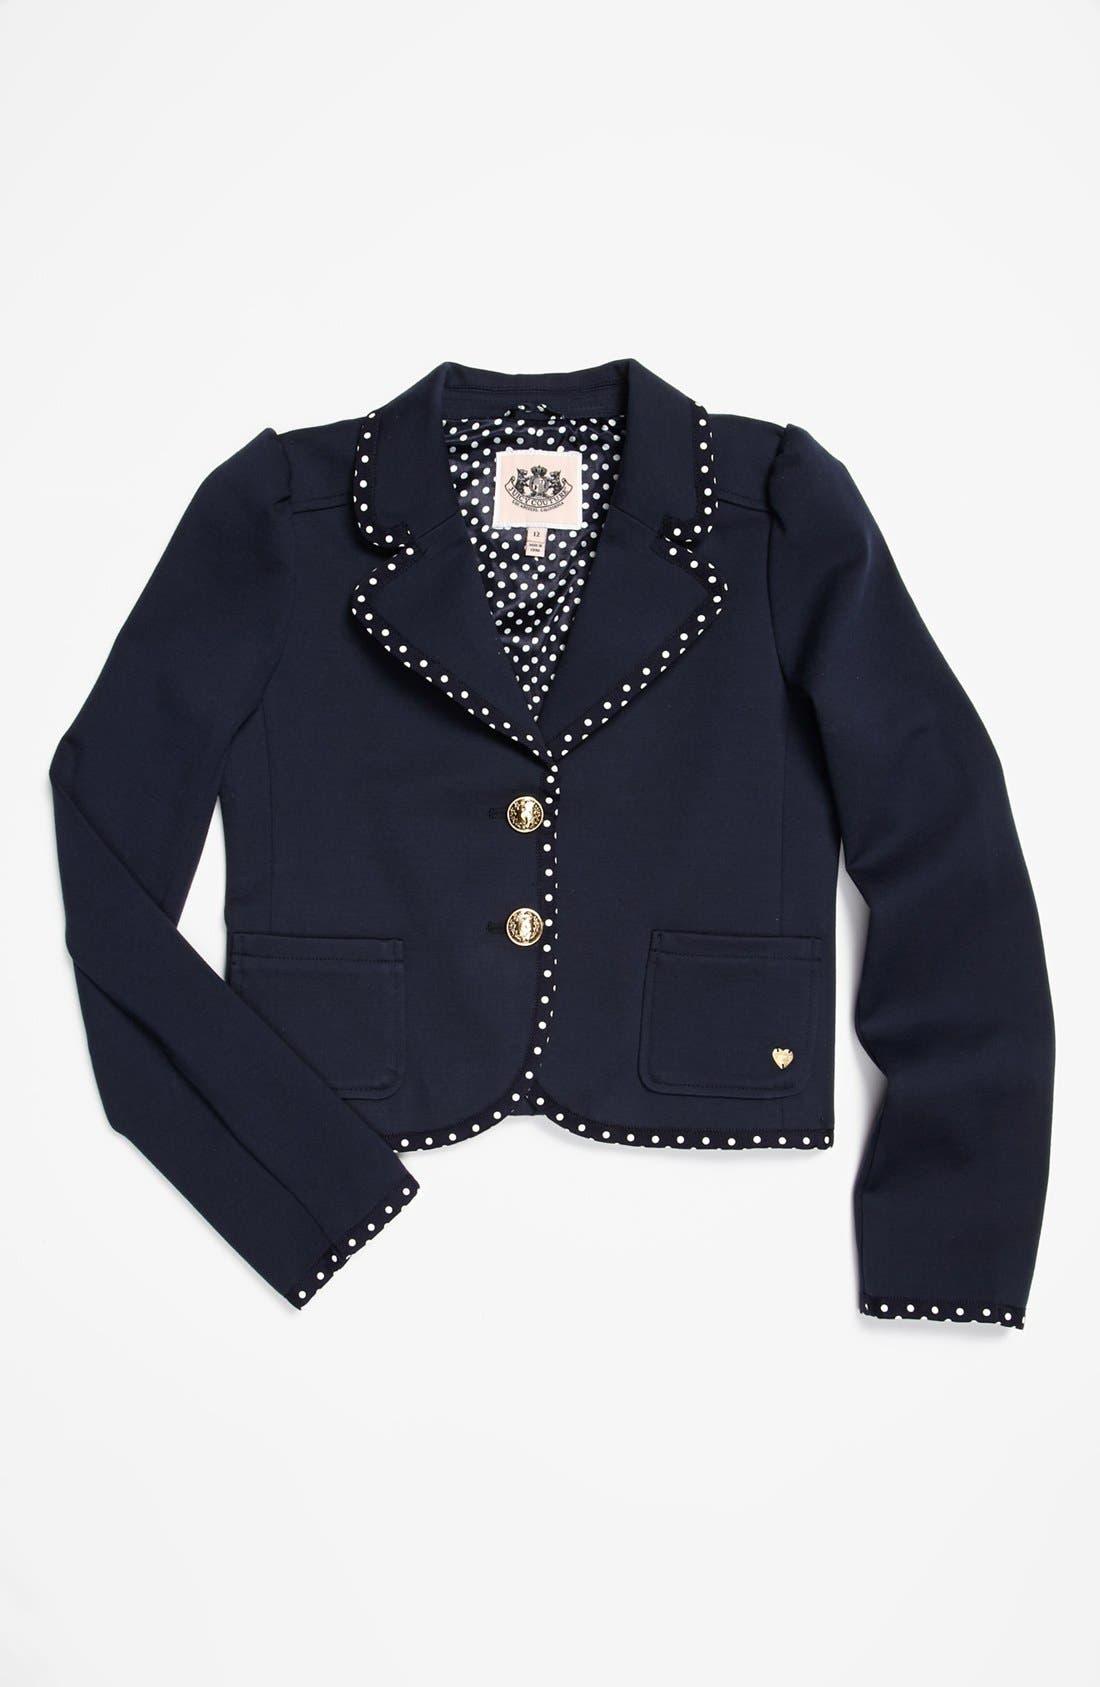 Alternate Image 1 Selected - Juicy Couture Ponte Jacket (Big Girls)